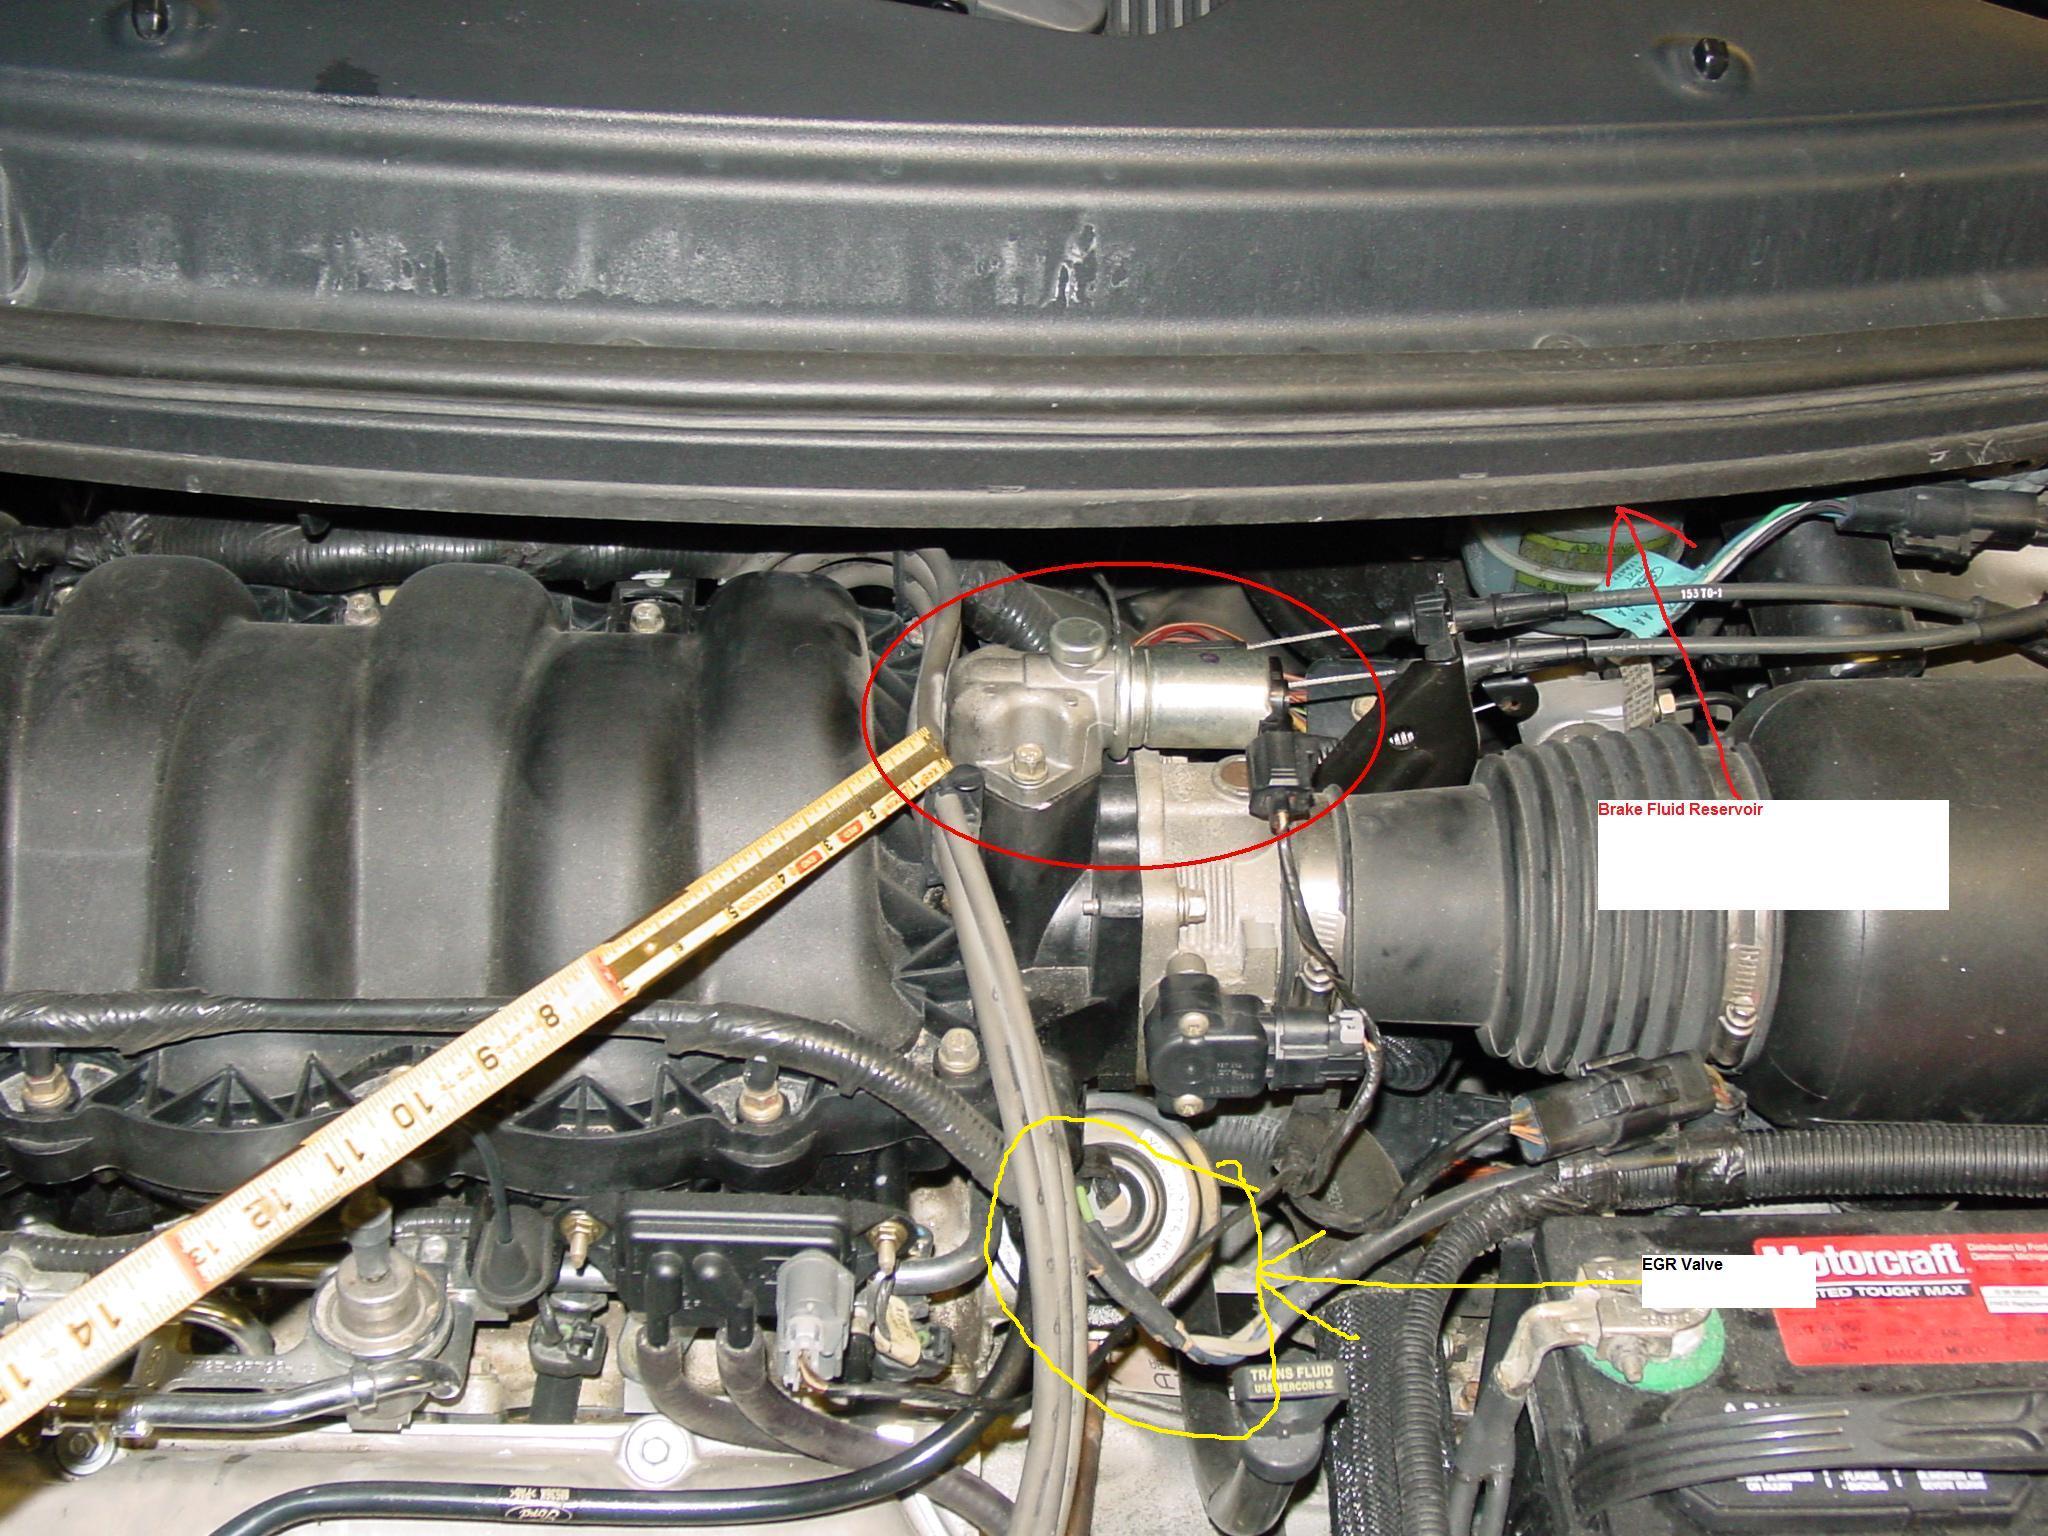 2001 Windstar 30 Engine 70k Mi Car Bucks At 45 Mph It Is Not 01 Wiring Diagram Graphic